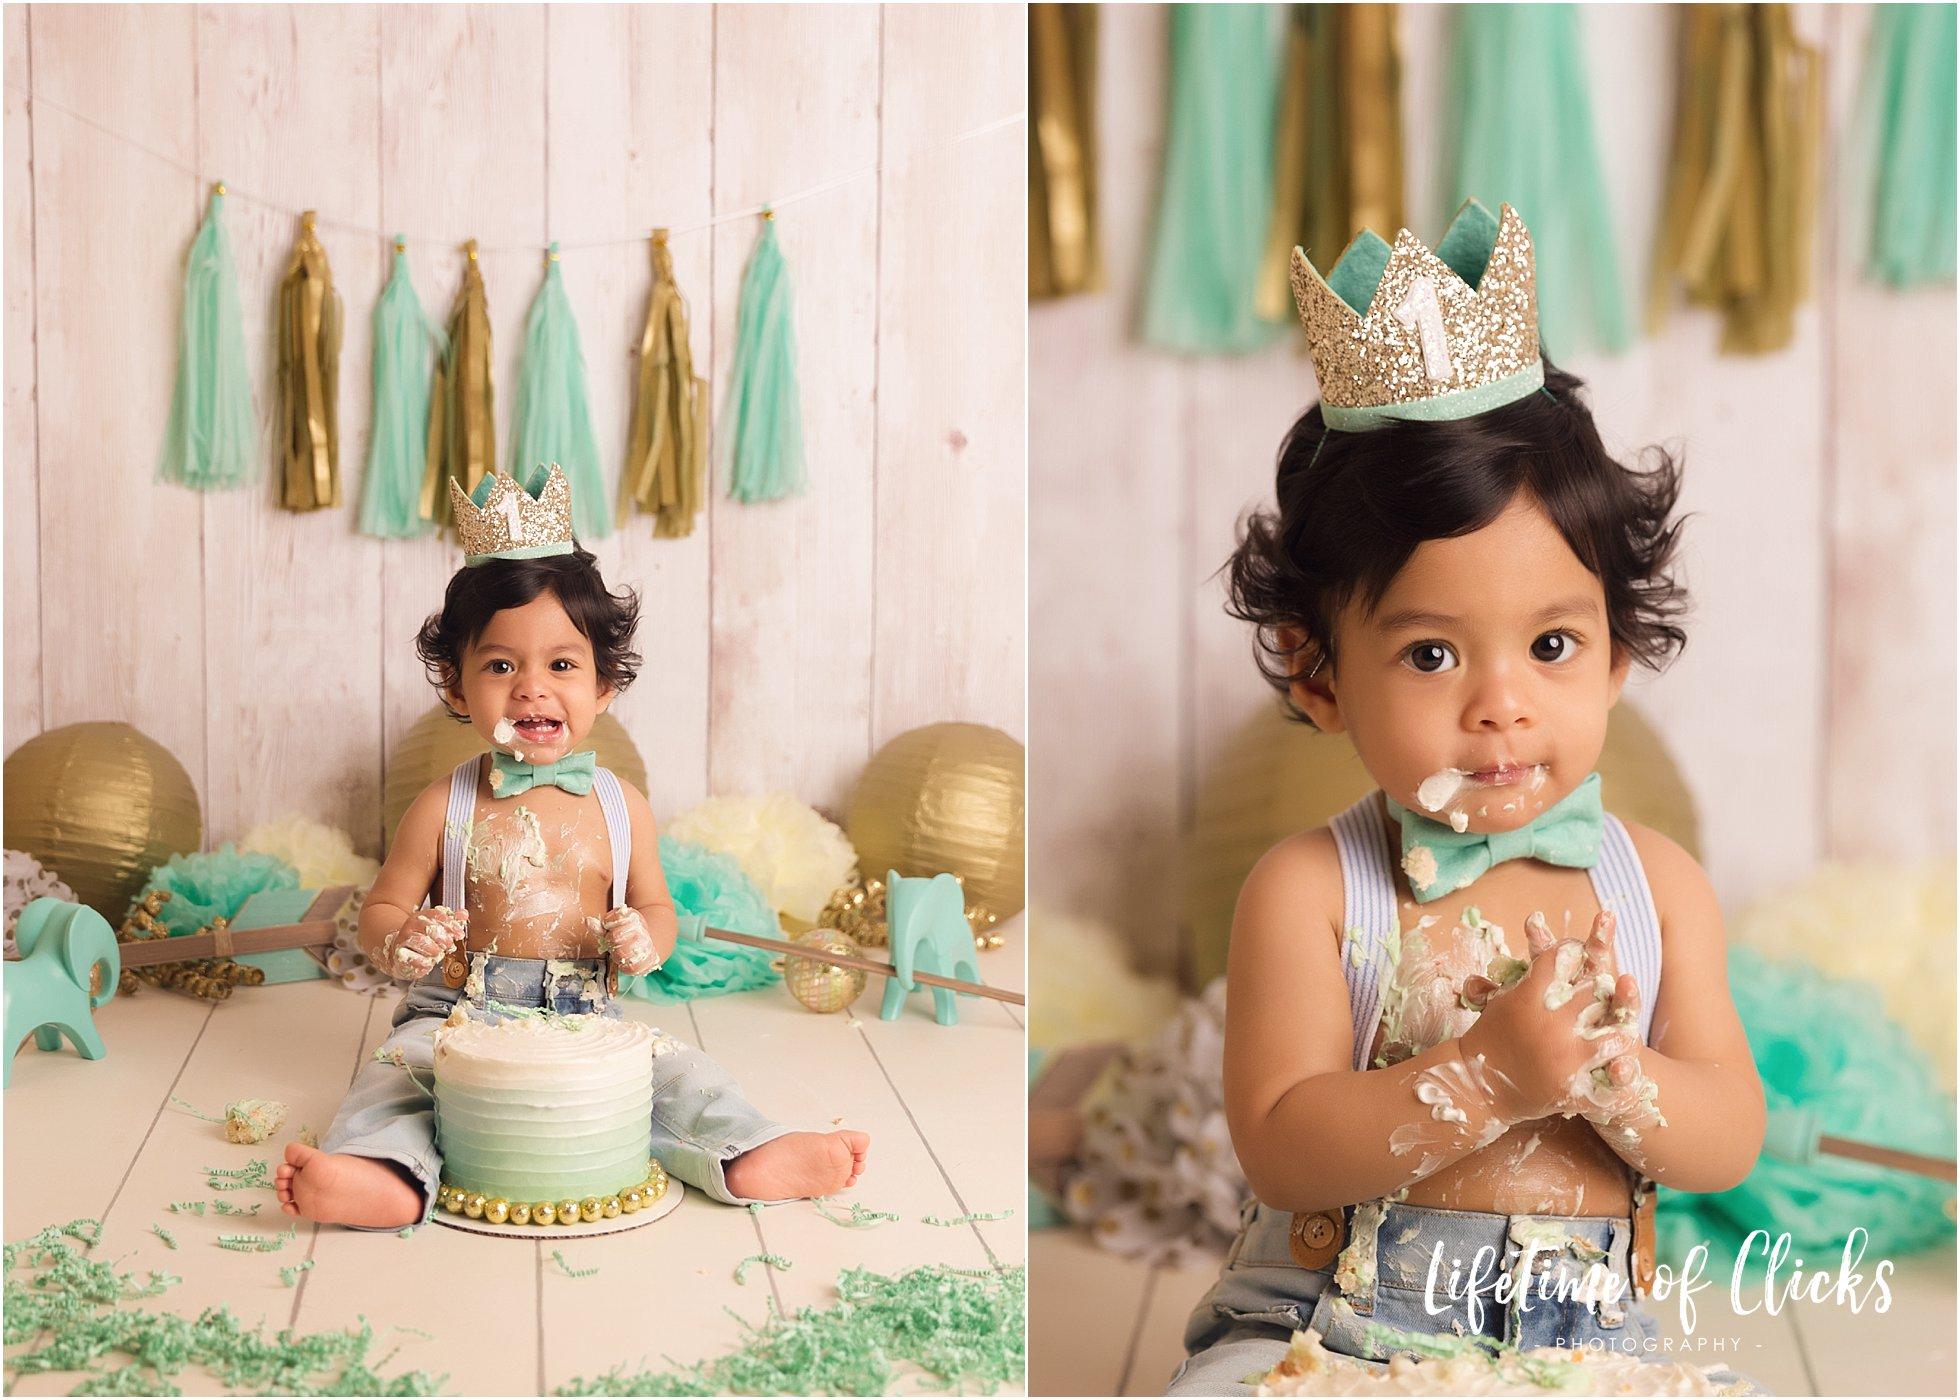 Adorable photos of baby boy's first birthday